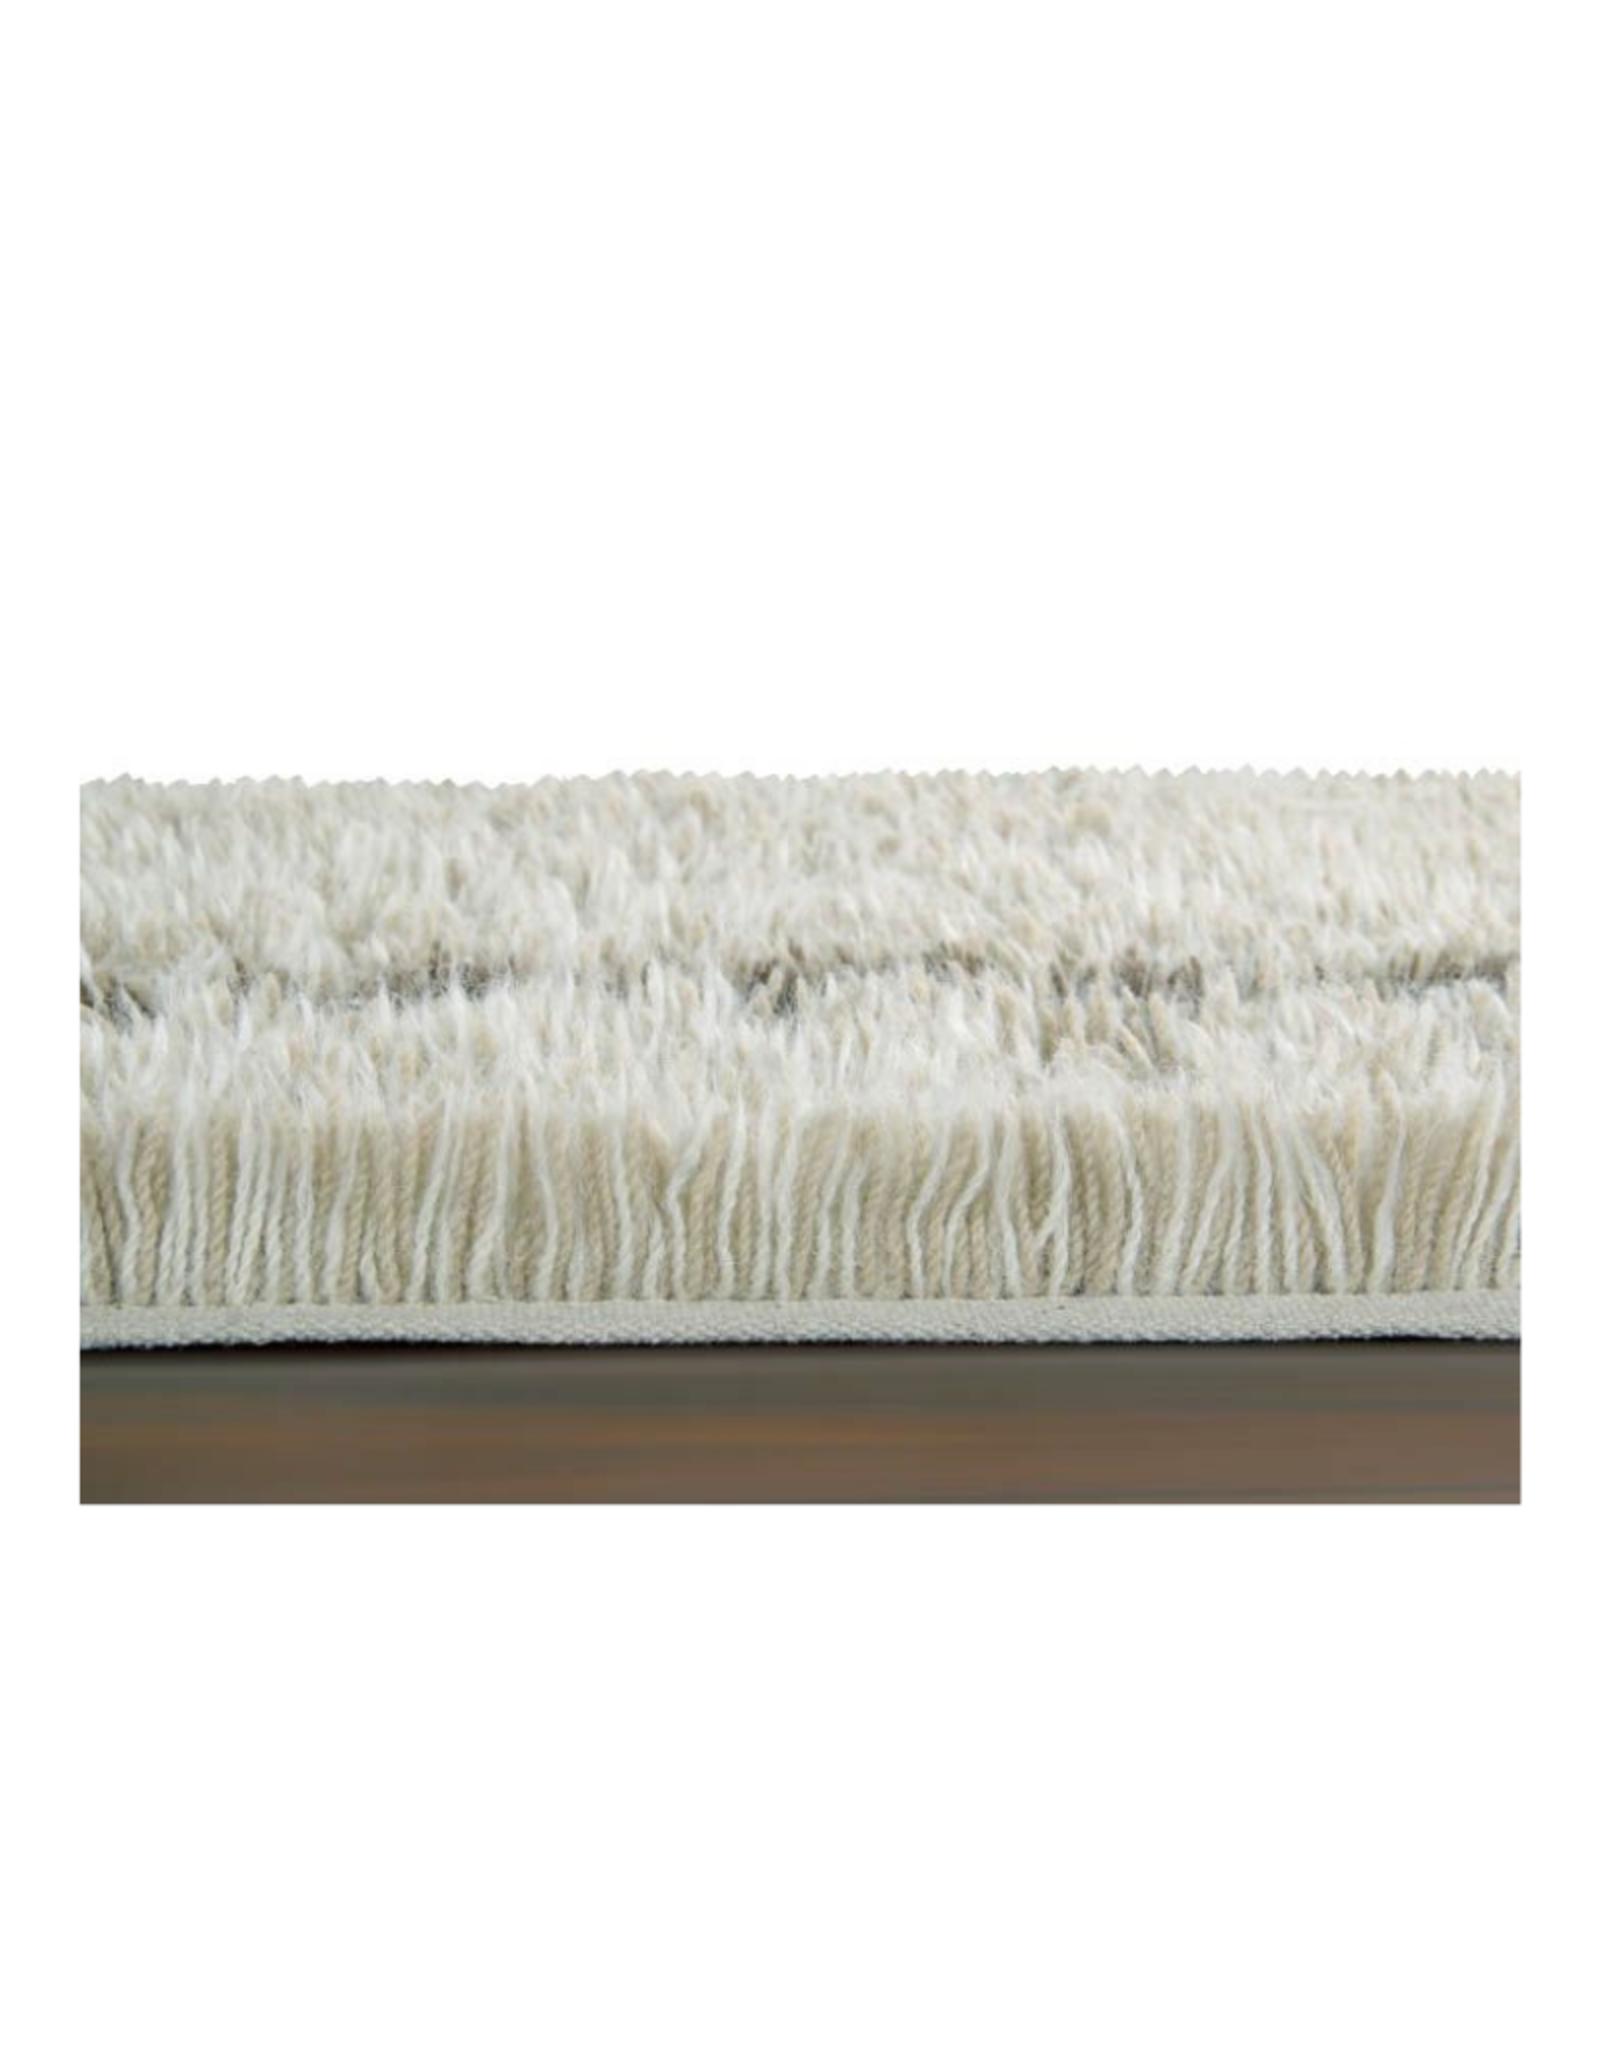 Lorena Canals Vloerkleed Autumn Breeze 170 x 240 cm - Woolable